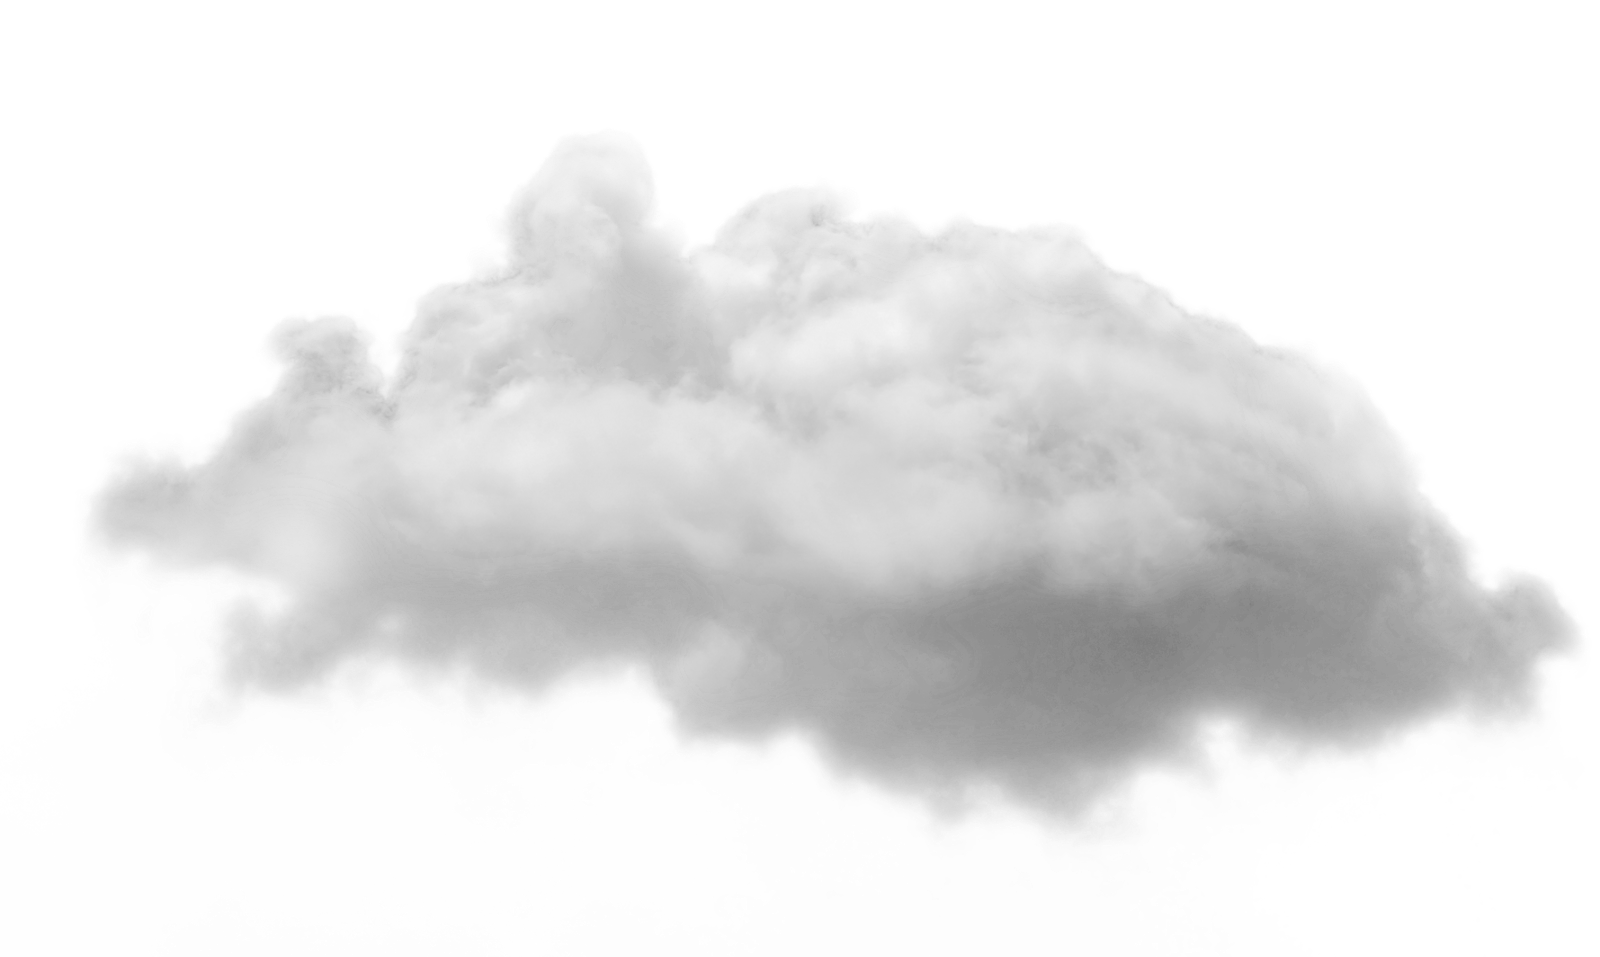 Cut out acur lunamedia. Cloud clipart puffy cloud